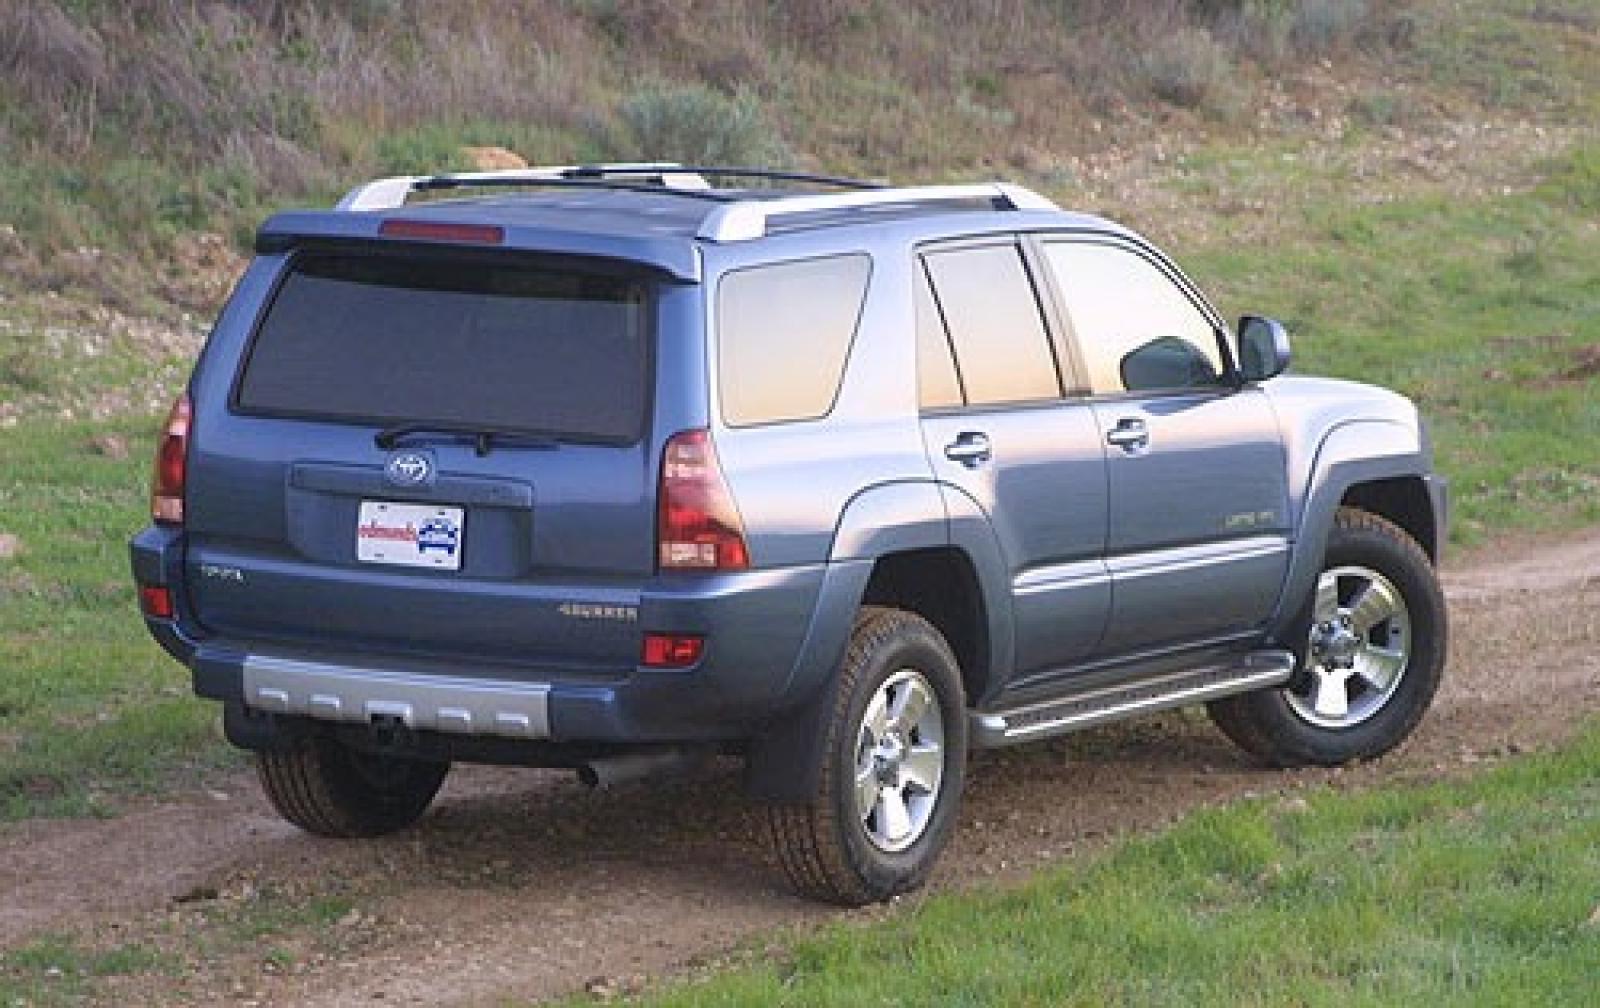 2005 toyota 4runner 8 2003 toyota 4runner rear interior 8 800 1024 1280 1600 origin